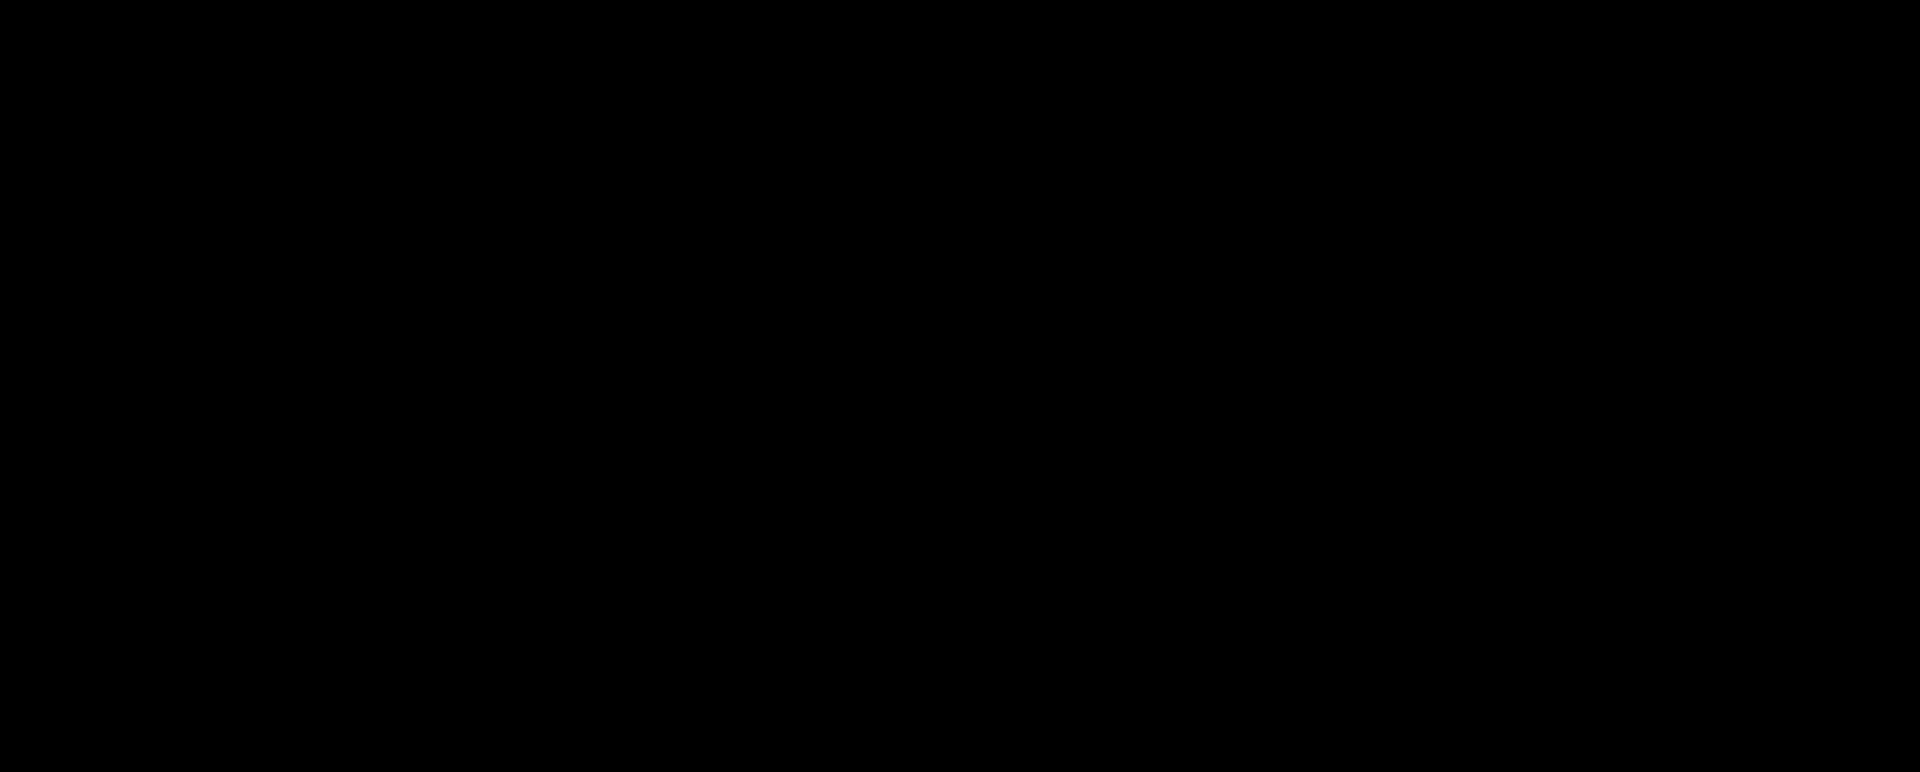 move-yourself-logo